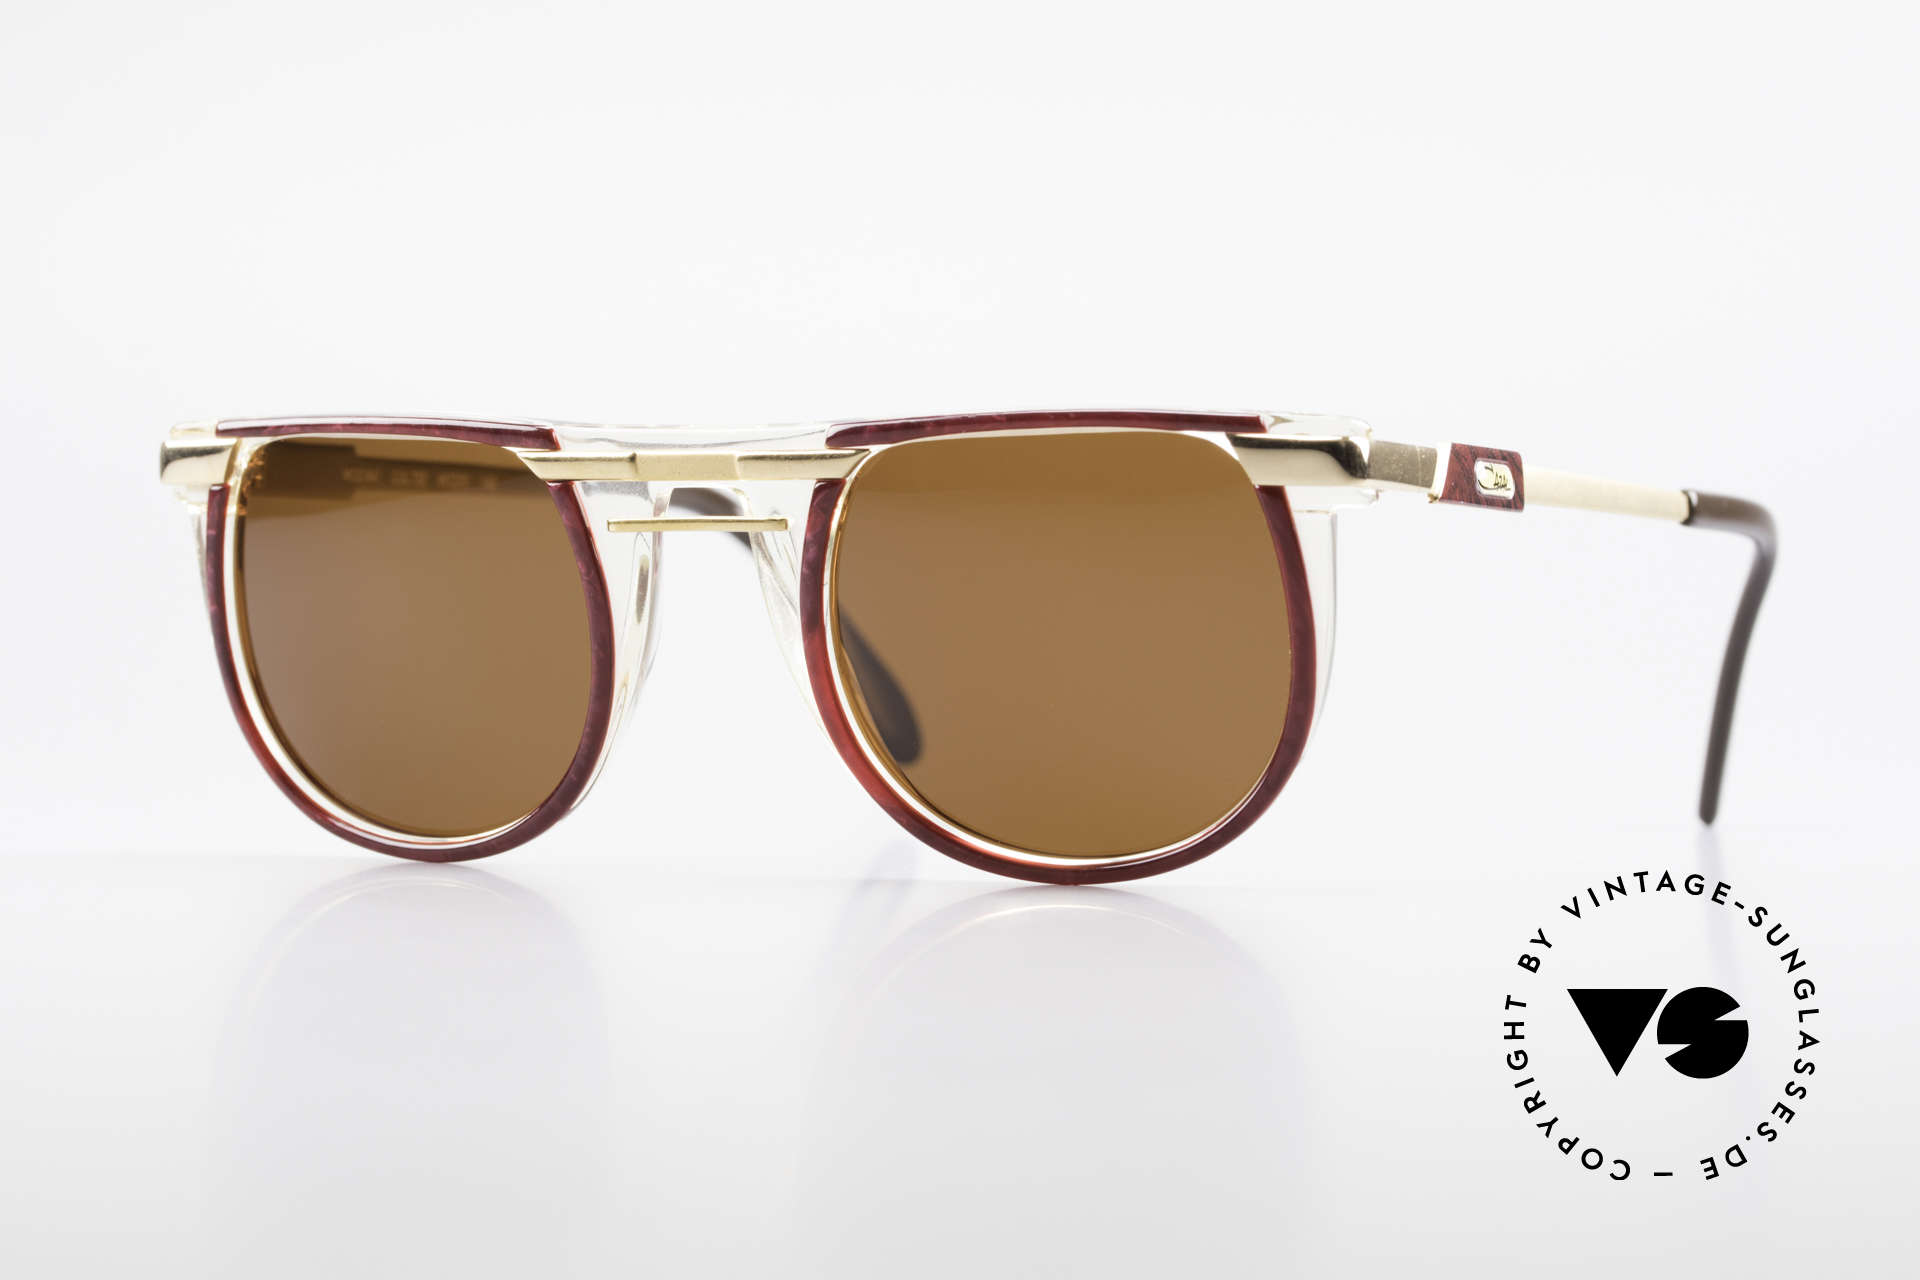 Cazal 647 90's Vintage Designer Shades, roundish 1990's designer sunglasses by CAZAL, Made for Men and Women